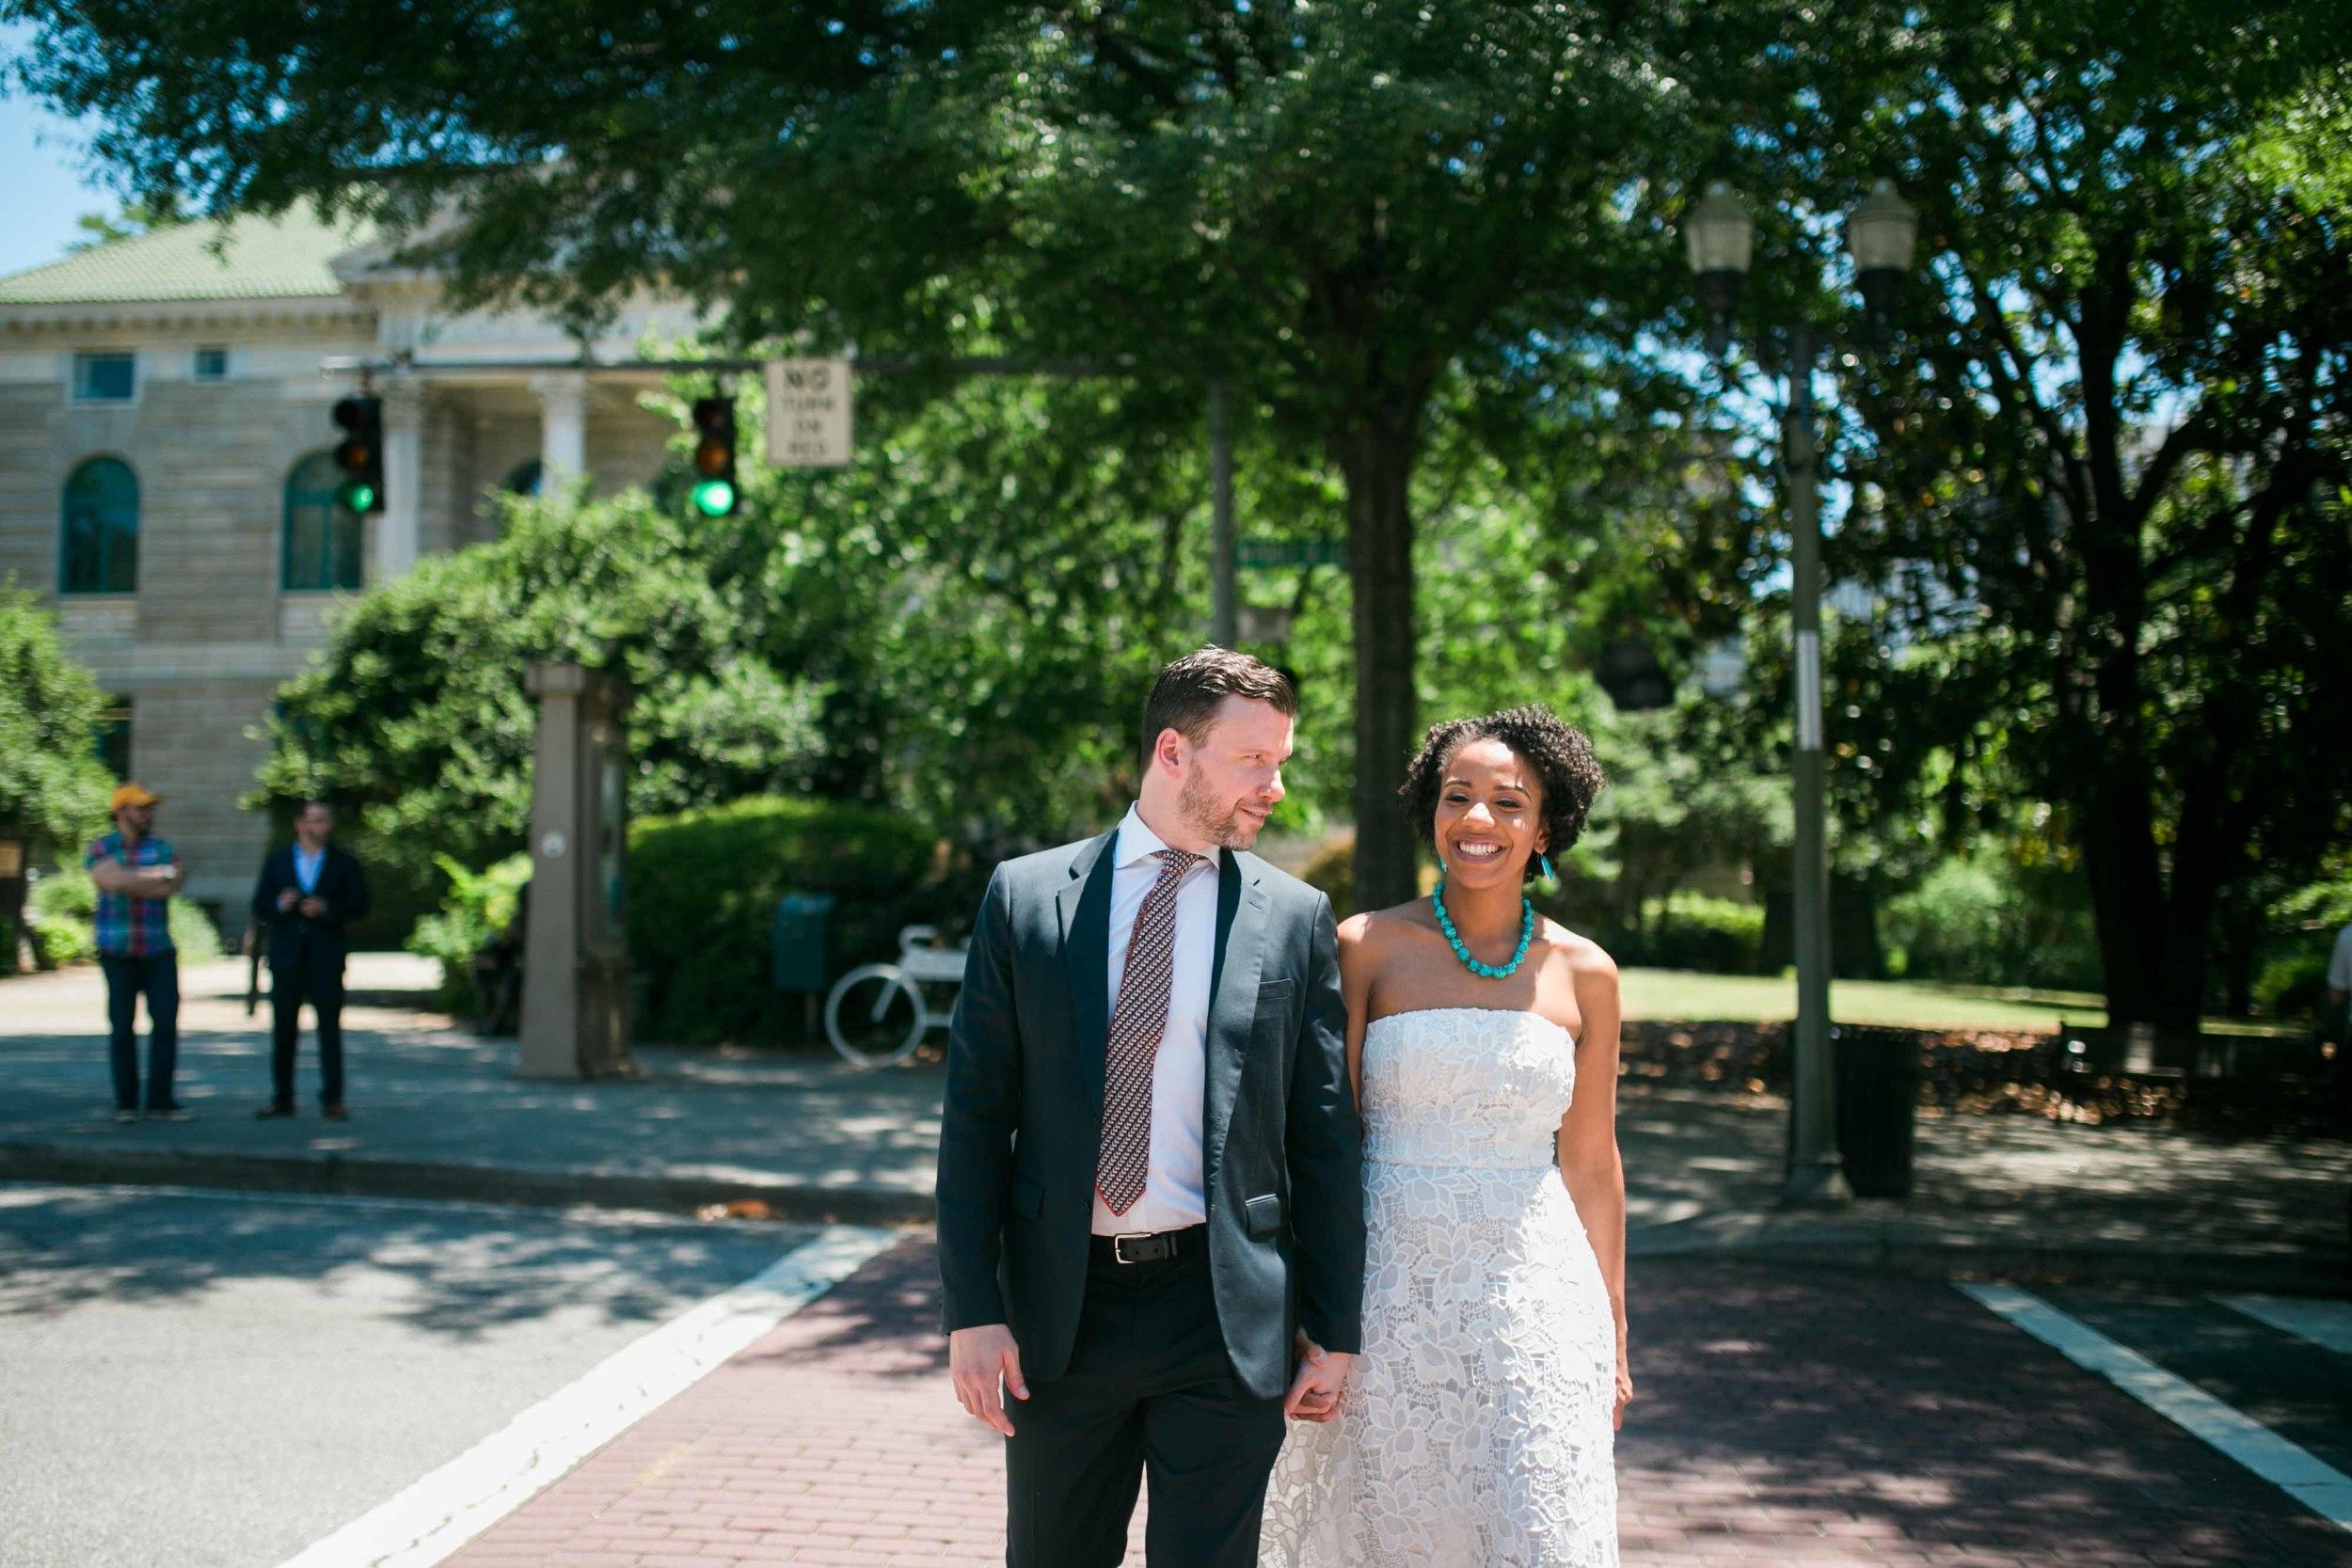 Dekalb-County-Courthouse-Wedding-Photos-Kiyah-C-Photography-56.jpg